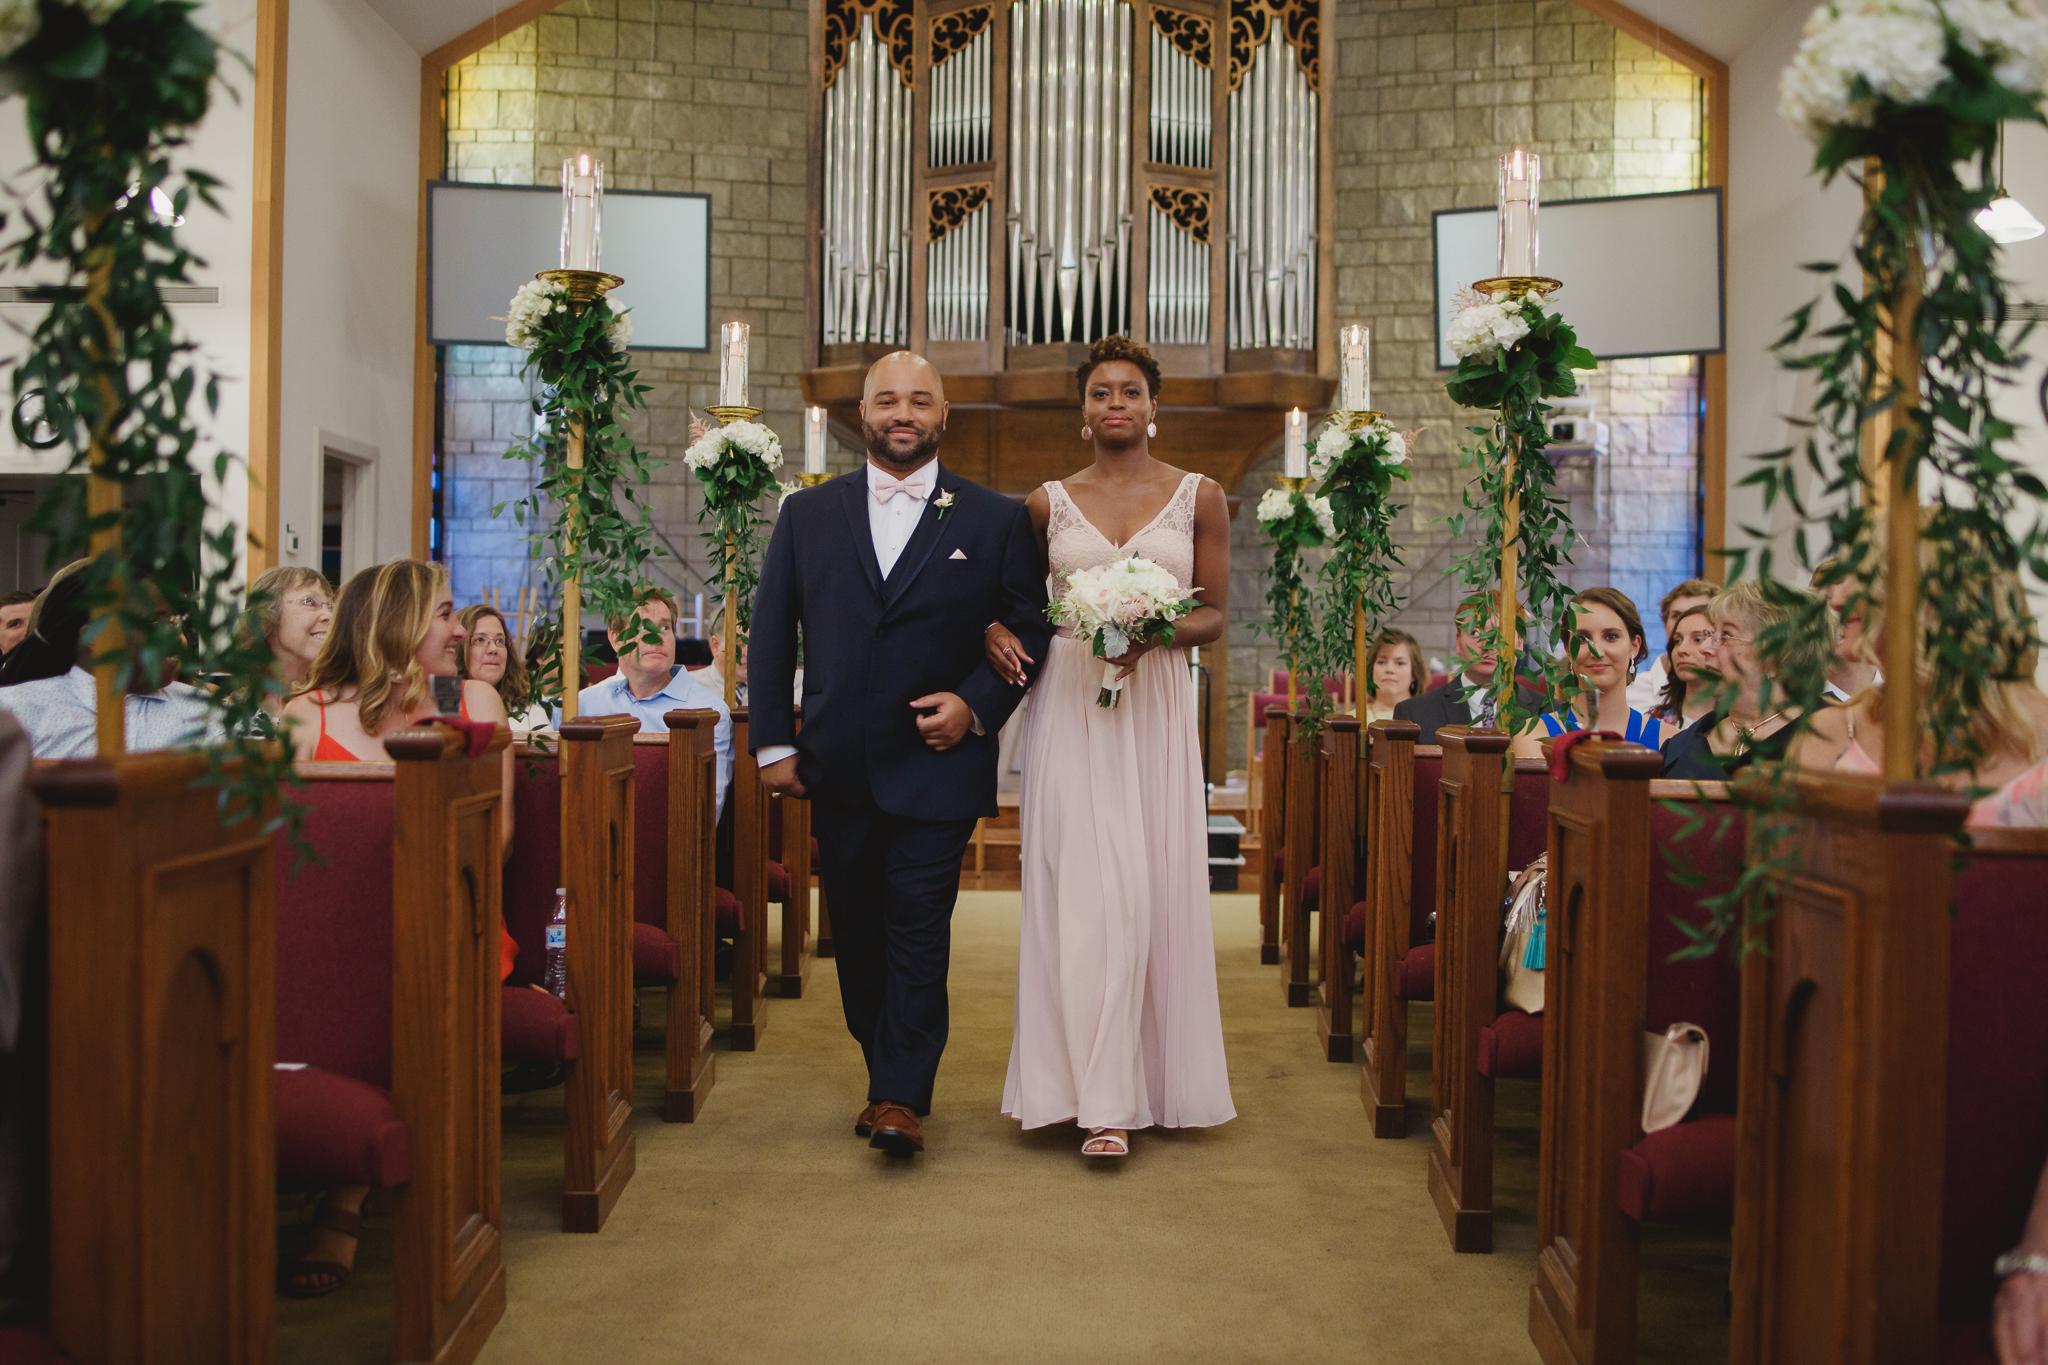 Michael and Kelly - the ashton depot - wedding DFW - wedding photographer- elizalde photography (19 of 150).jpg